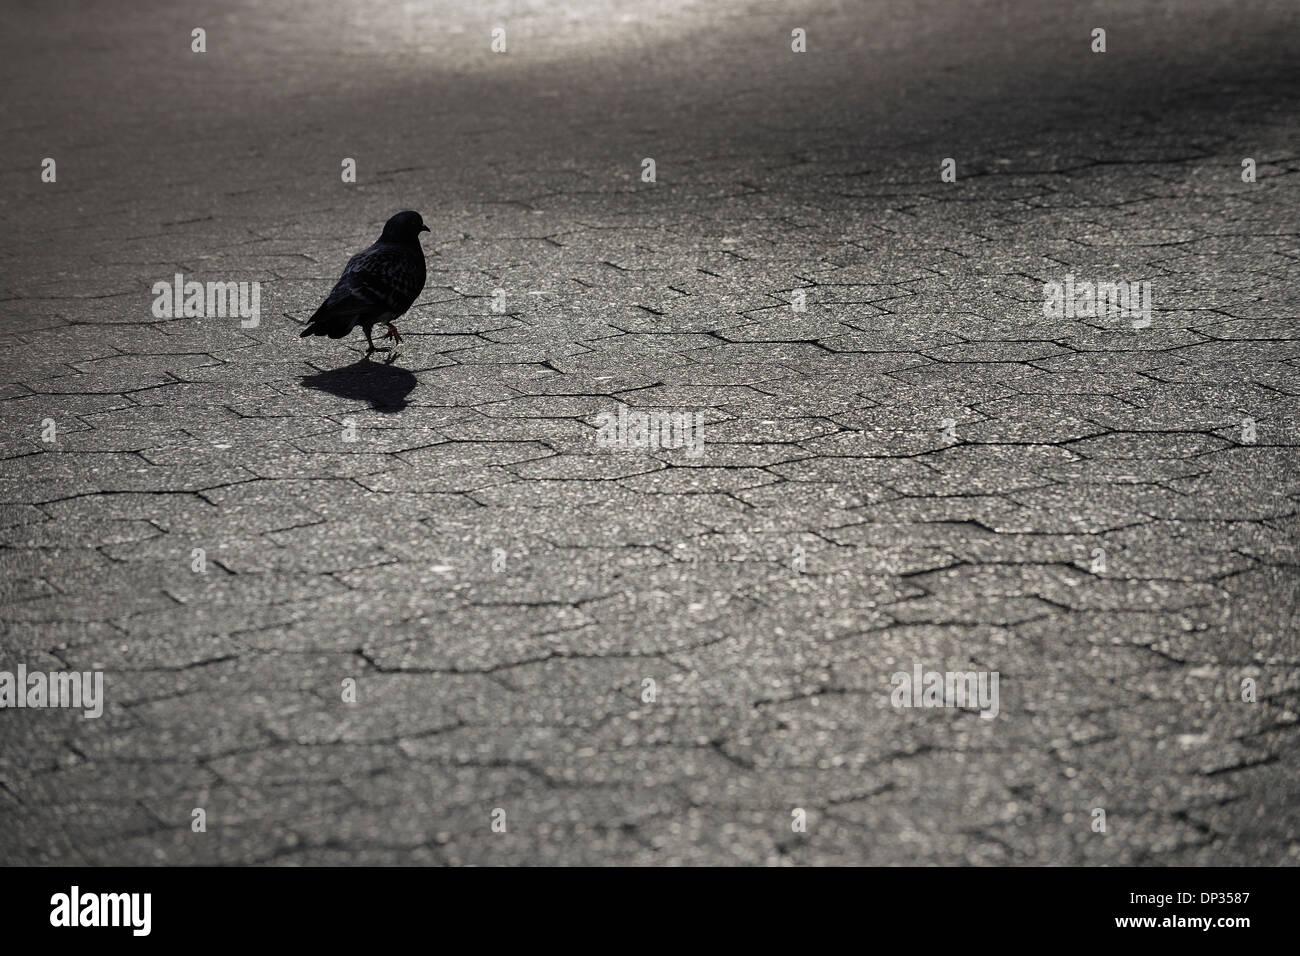 Silhouette de Pigeon sur pavés, Lower Manhattan, Manhattan, New York City, New York State, USA Banque D'Images